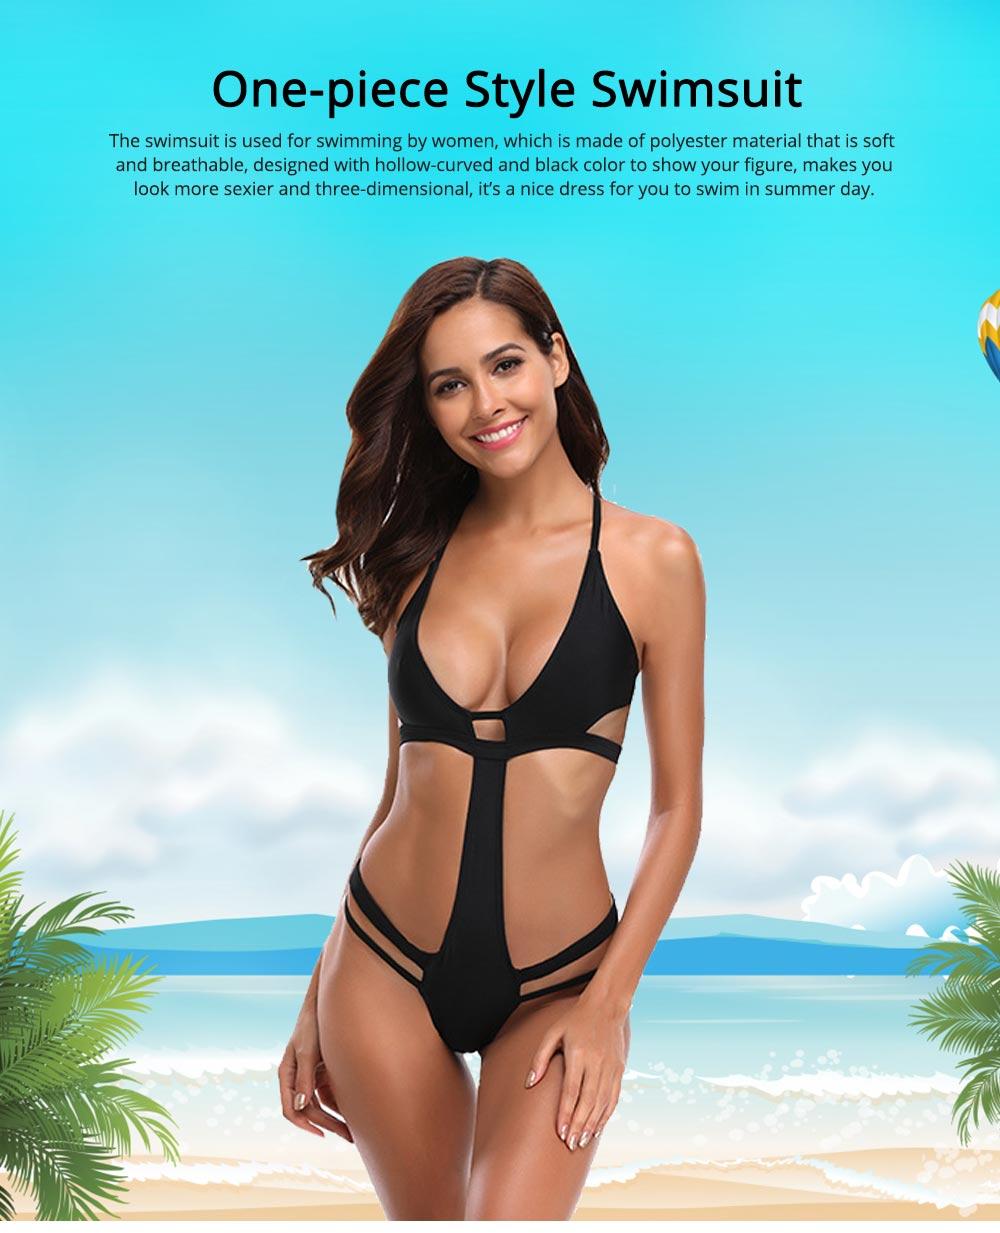 Polyester Material Black Bikini for Women Elastic Bathing Suit One-piece Style Swimsuit Summer Swimwear 0